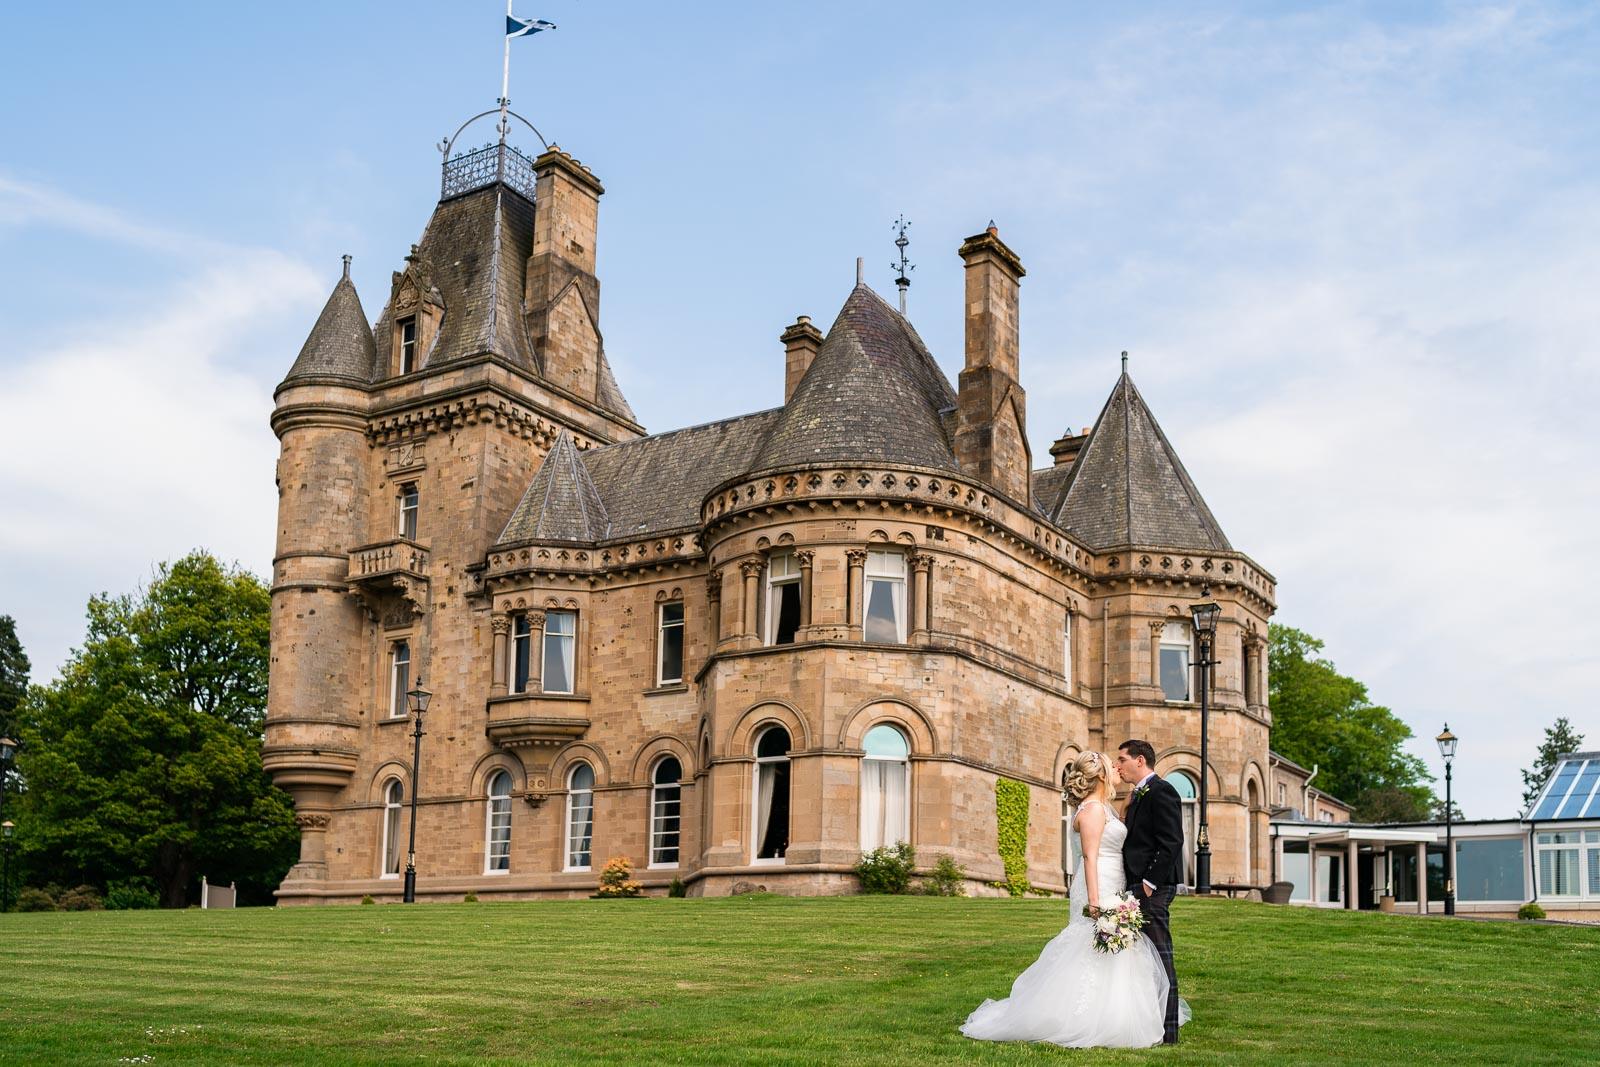 cornhill_castle_wedding_biggar_dearlyphotography (212 of 448).jpg